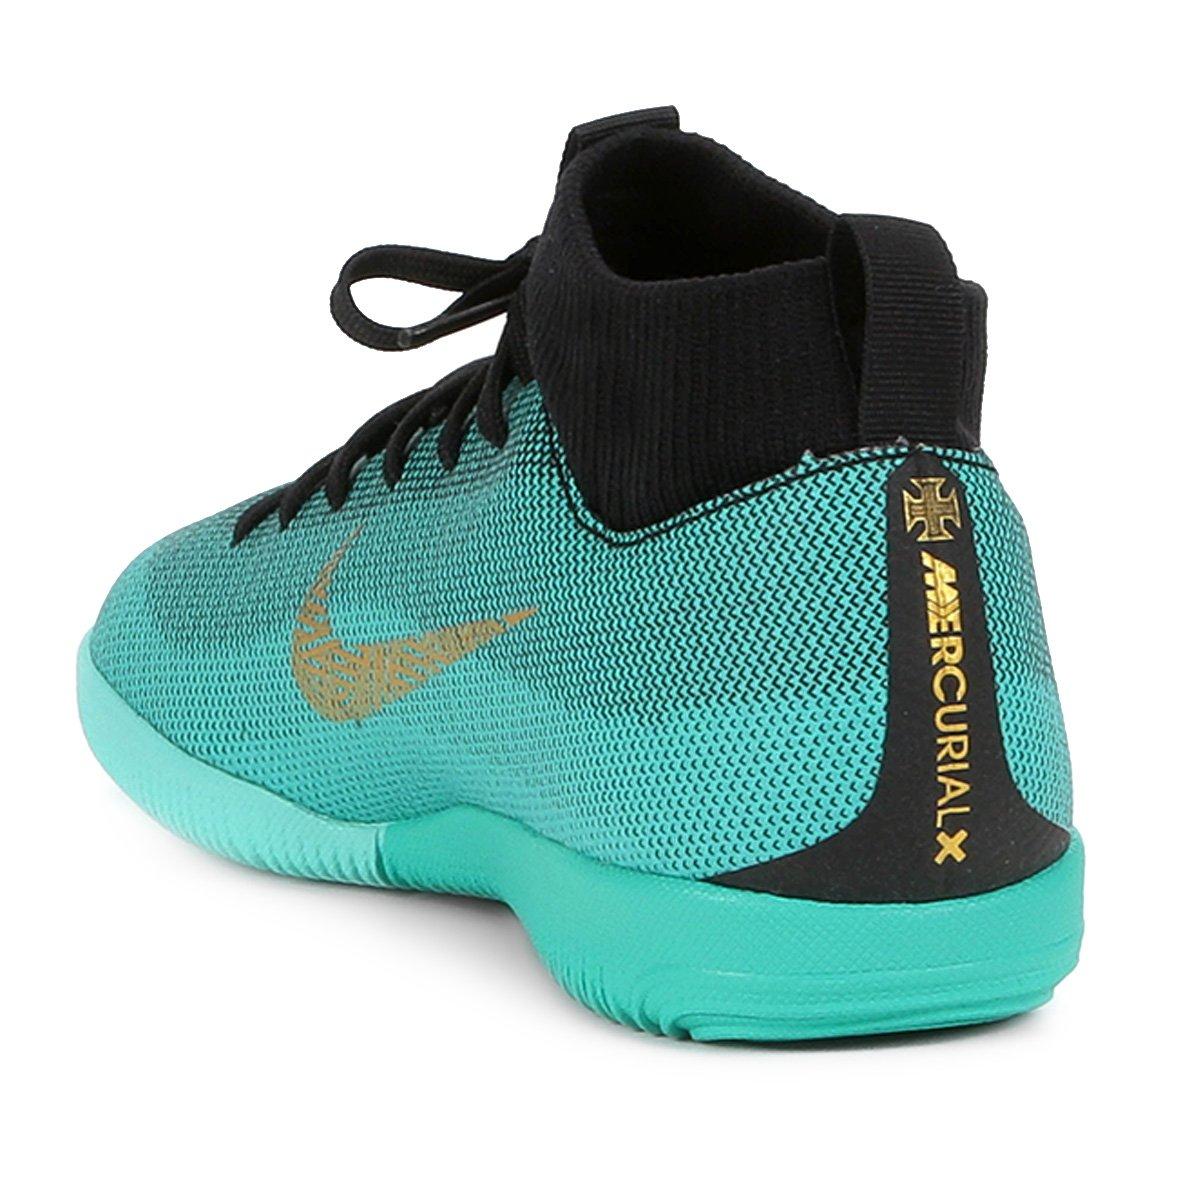 b3134e49f4 Chuteira Futsal Infantil Nike Superfly 6 Academy GS CR7 IC - Dourado ...